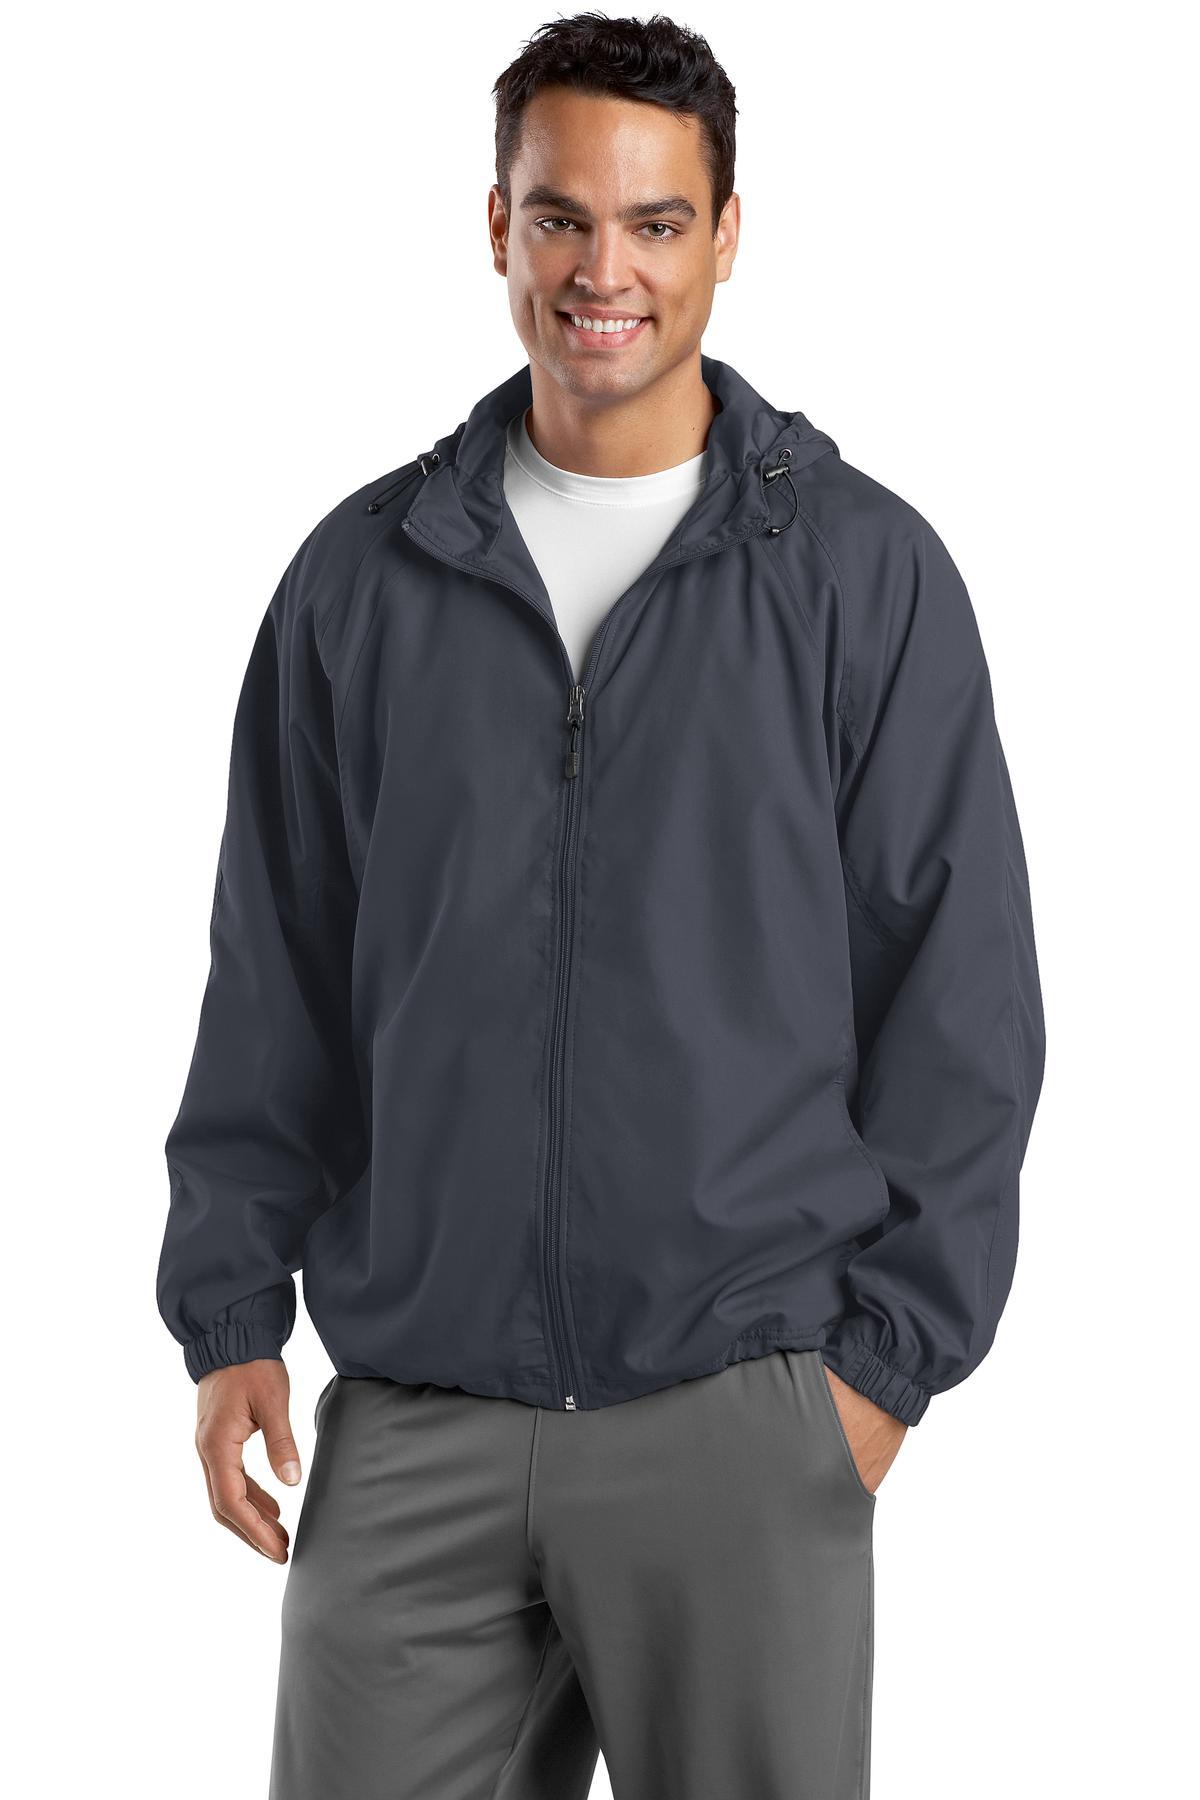 Sport-Tek - Hooded Raglan Jacket. JST73